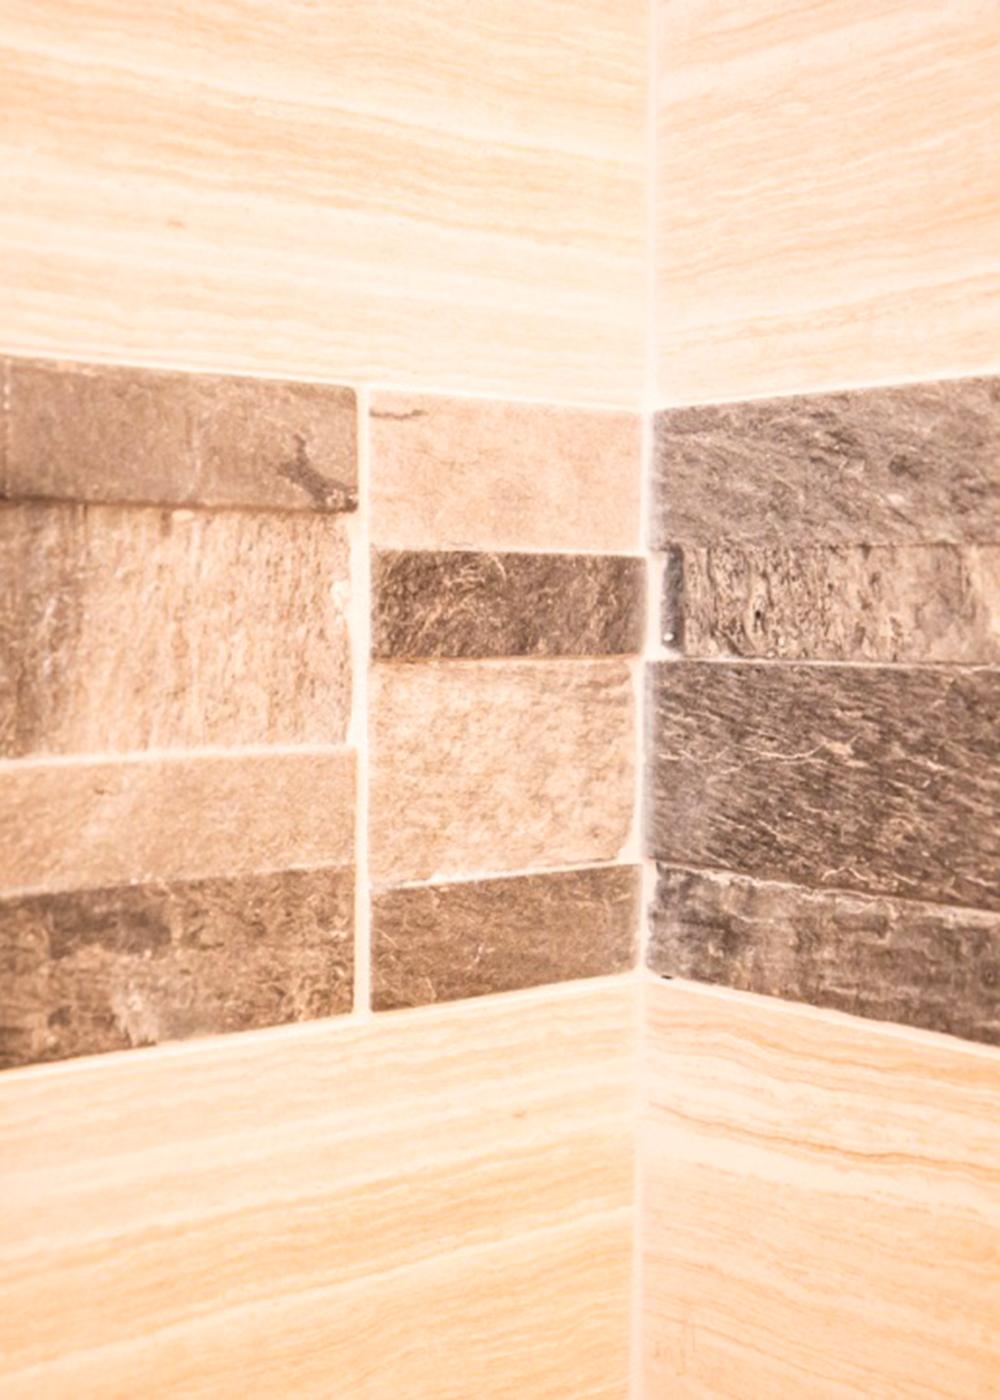 Tile closeup detail